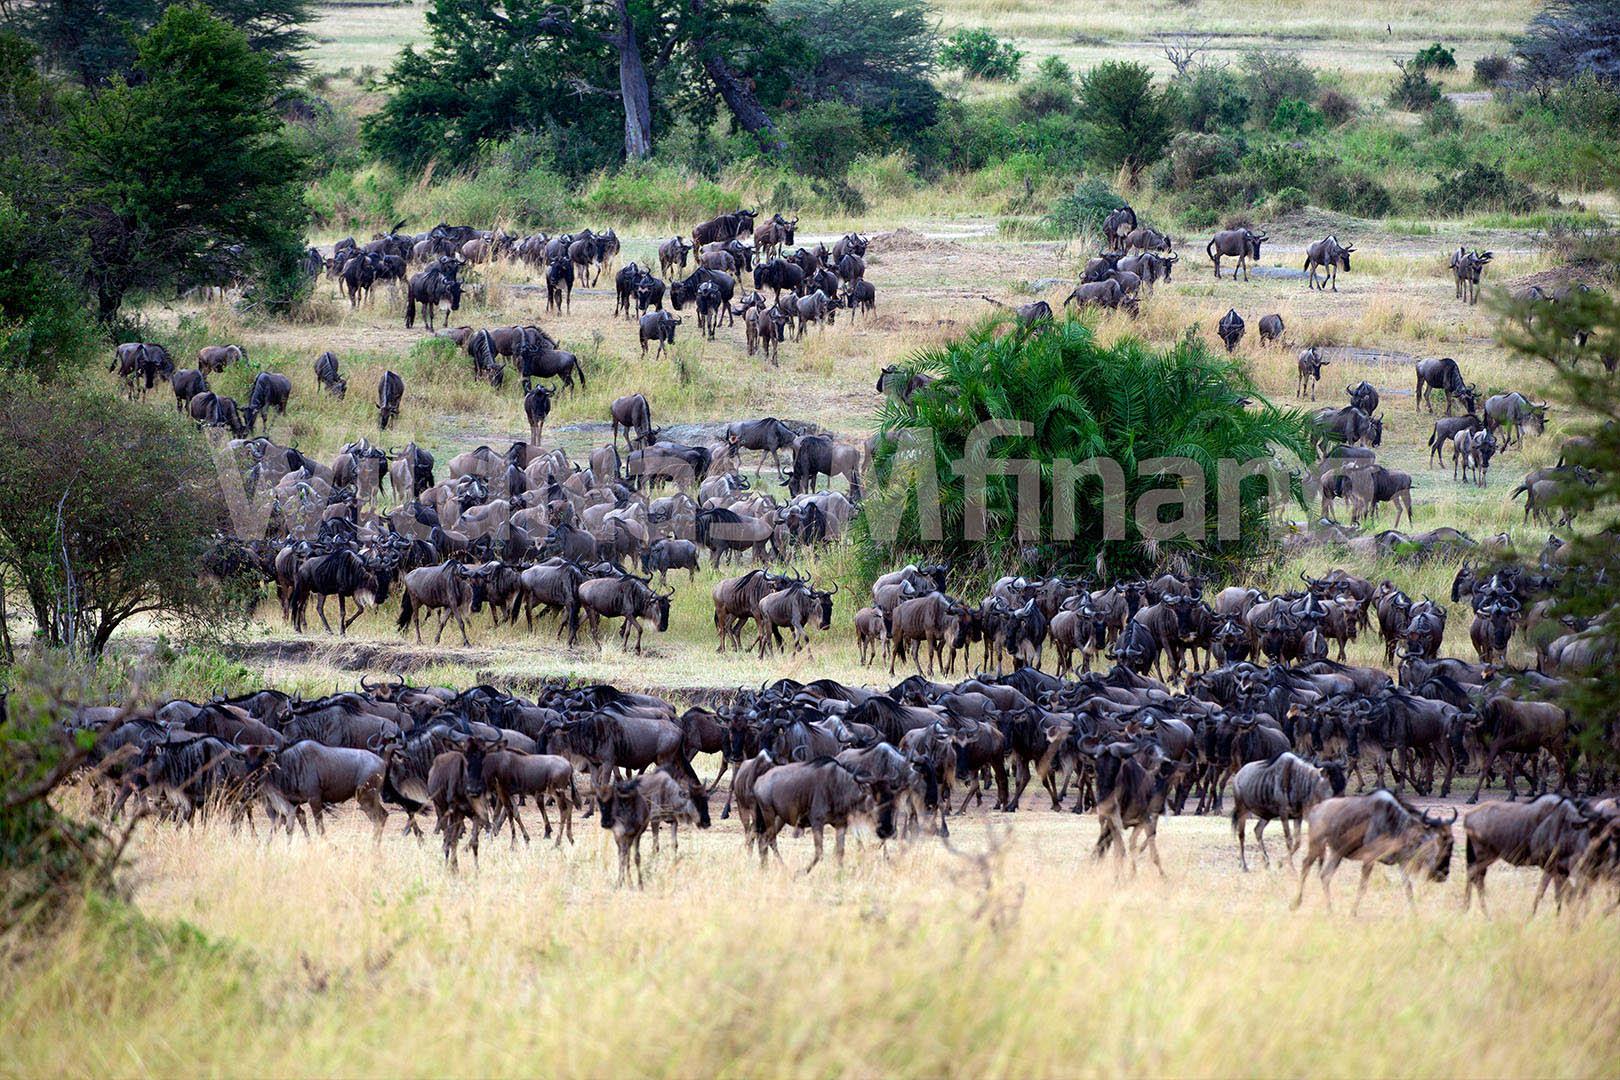 gallery-maasai-wanderings-safari-itineraries-signature-photo-safaris-africa-migration